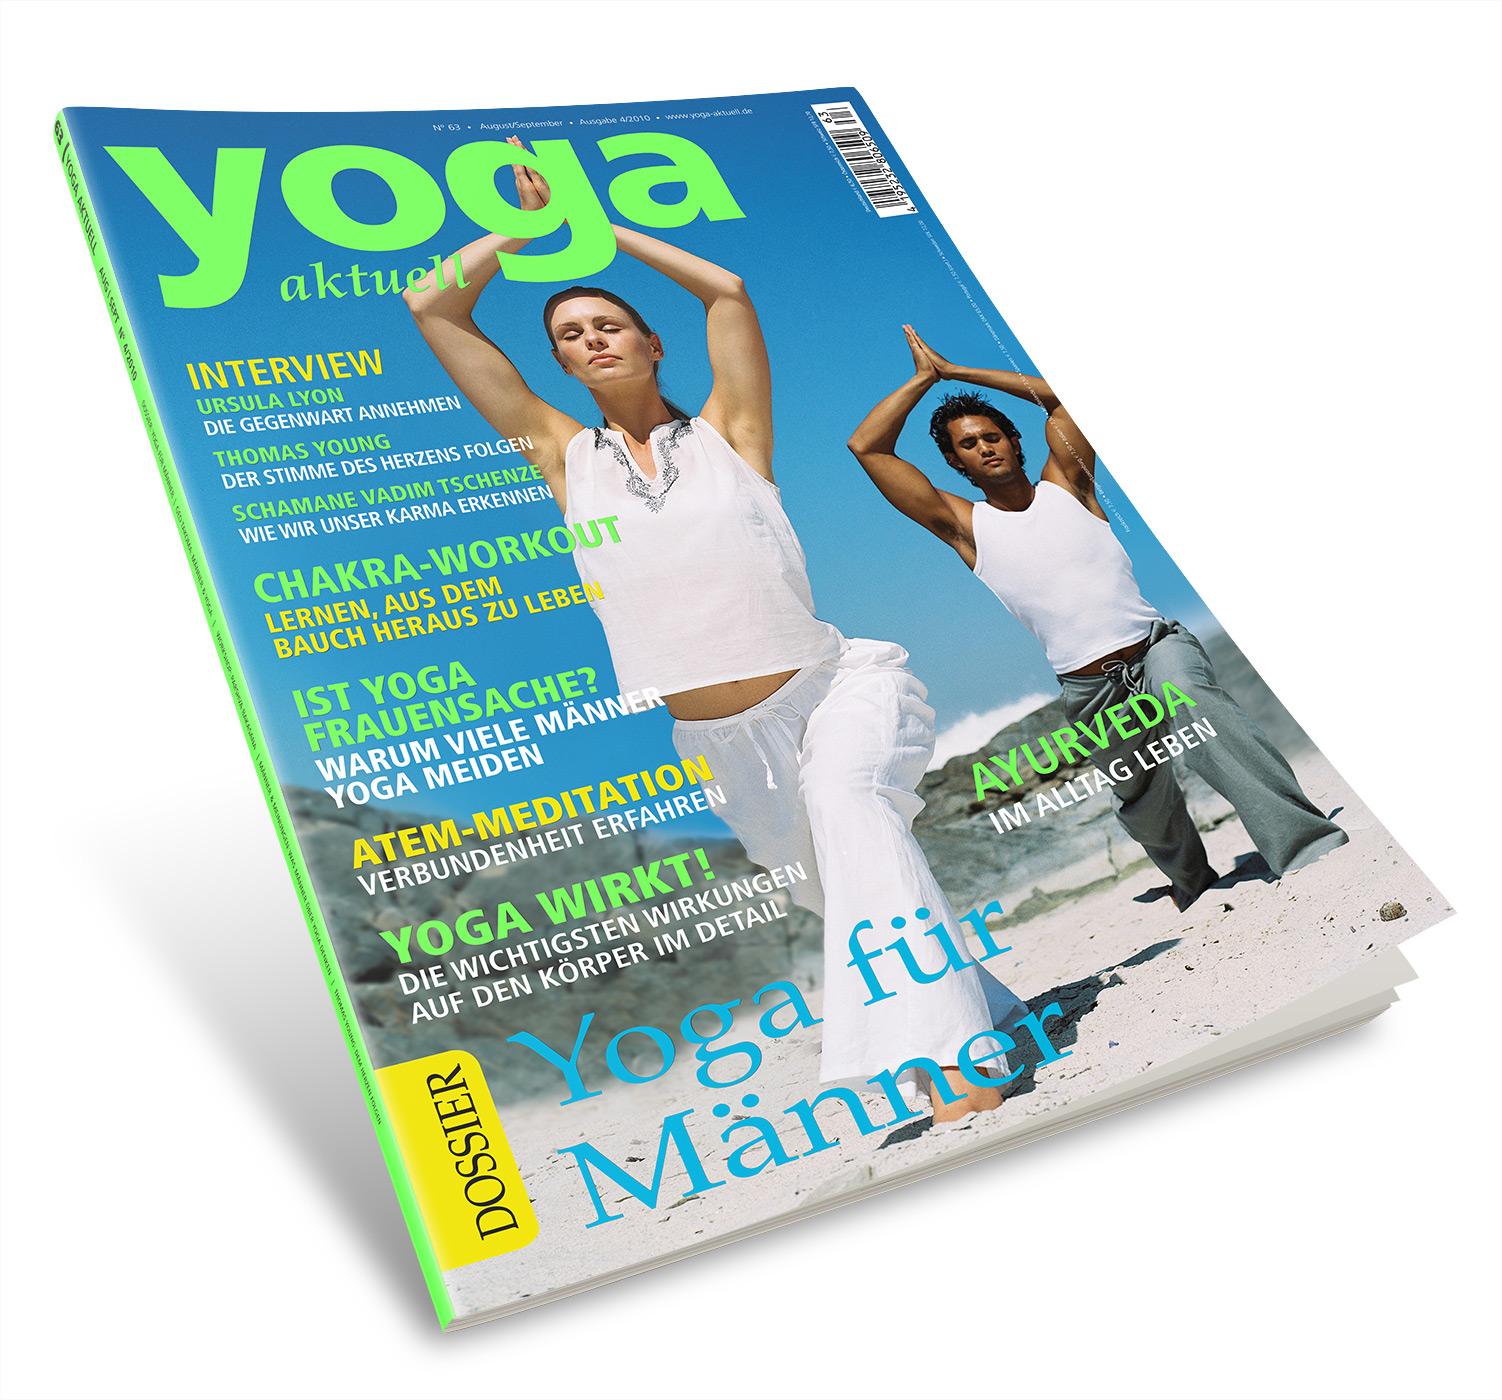 Yoga Aktuell 63 - 04/2010